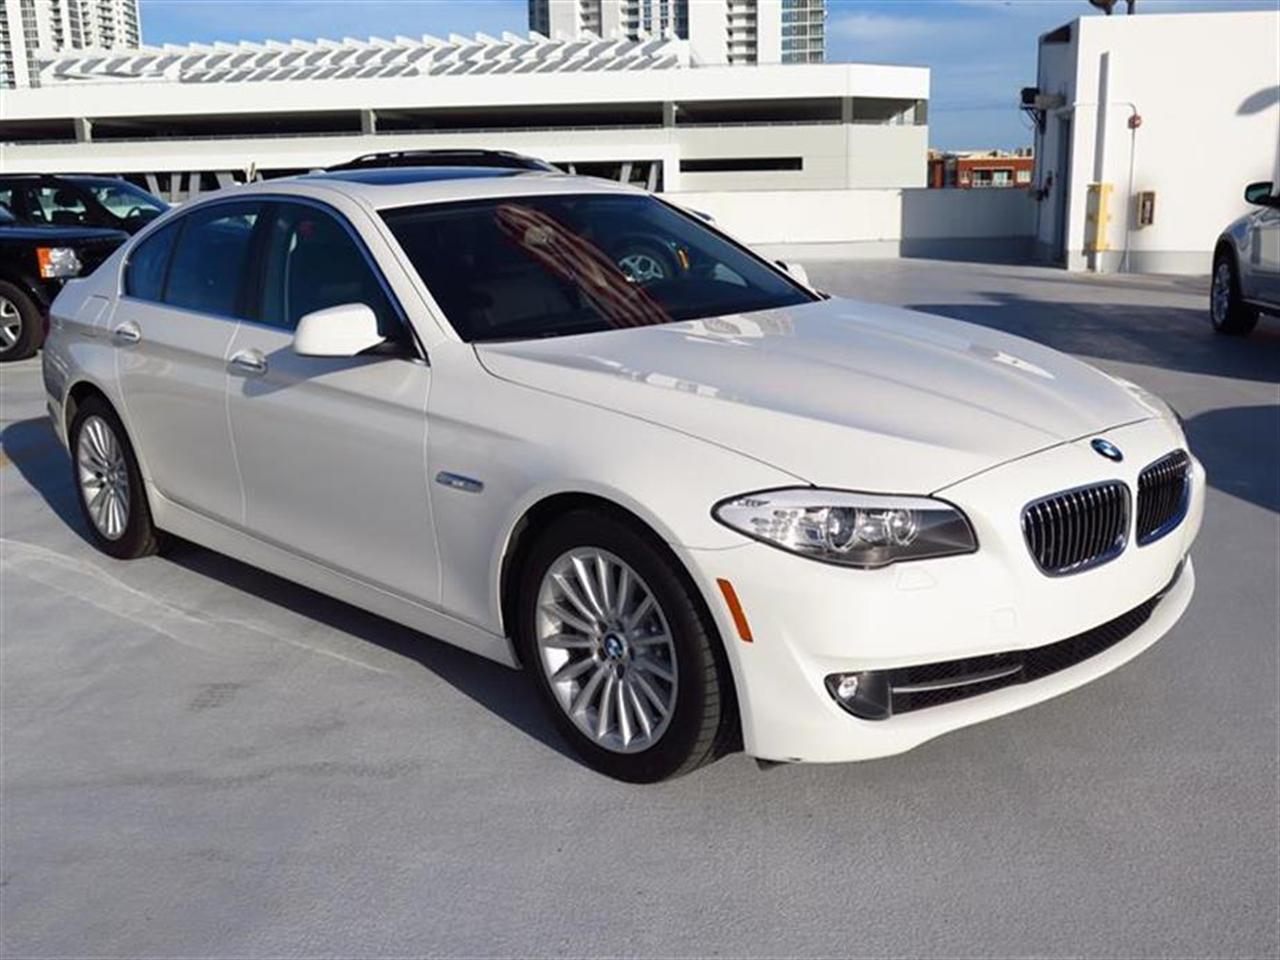 2013 BMW 5 SERIES 4dr Sdn 535i RWD 176310 miles 10-way power-adjustable front bucket seats -inc